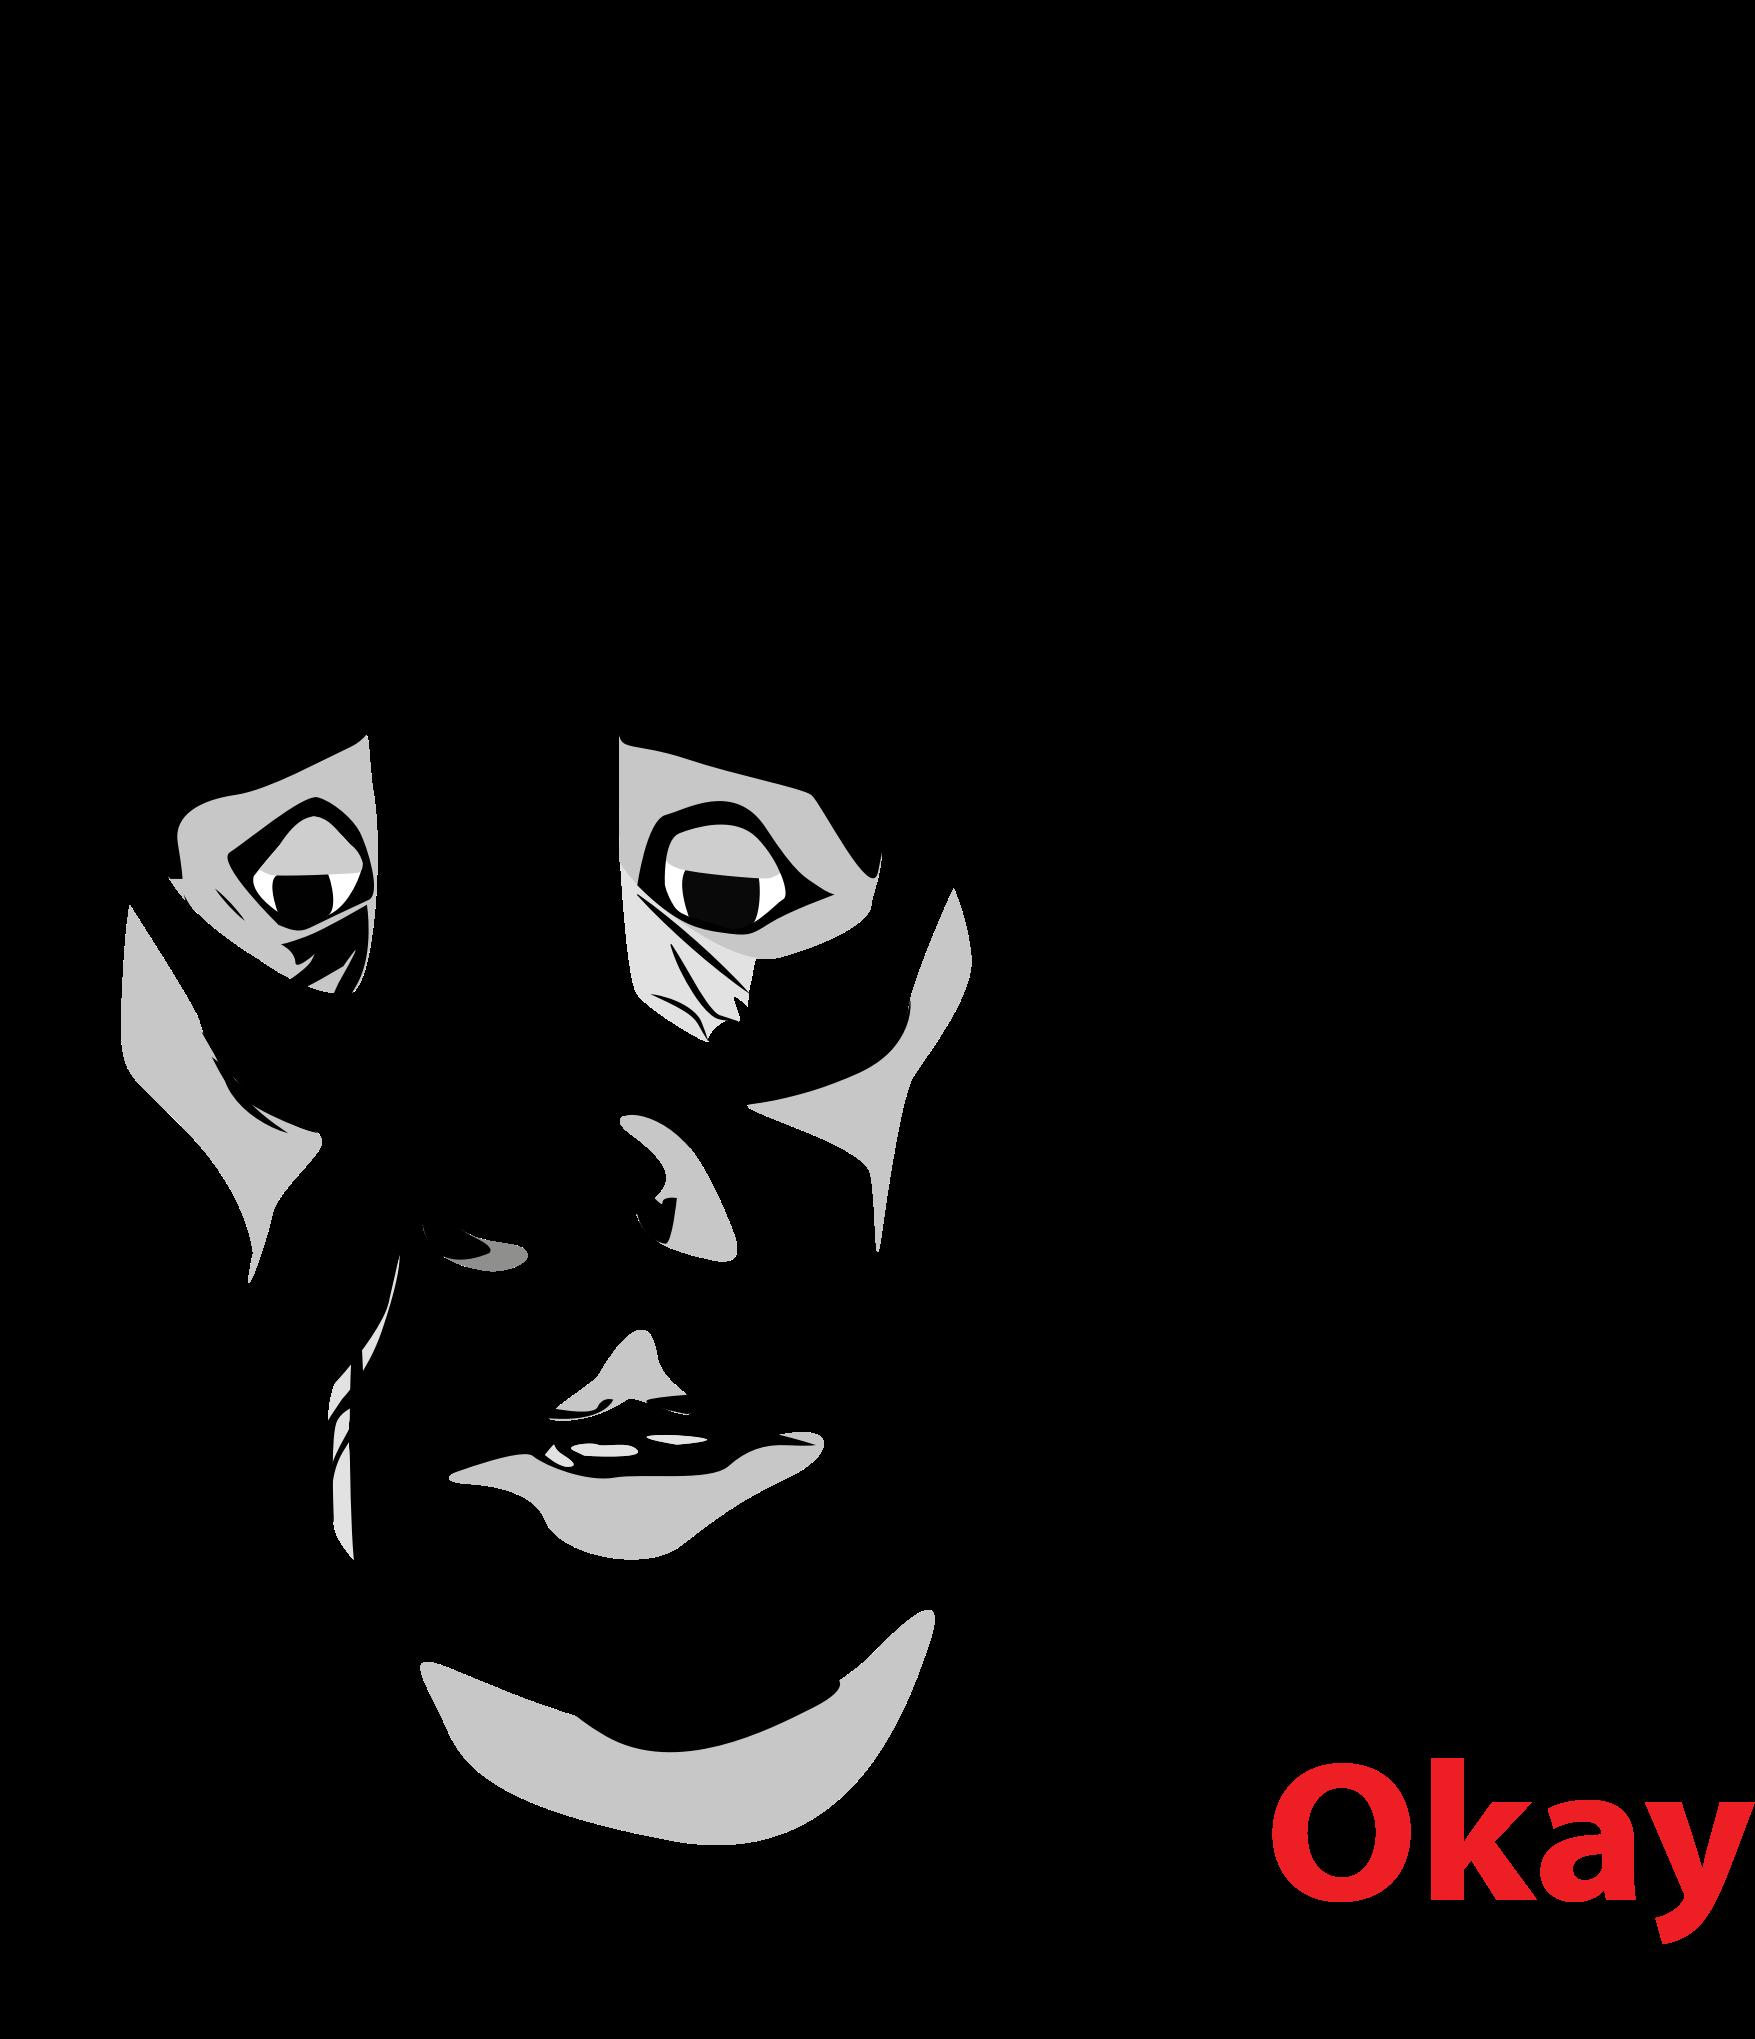 Free Sad Meme Face Png, Download Free Clip Art, Free Clip.